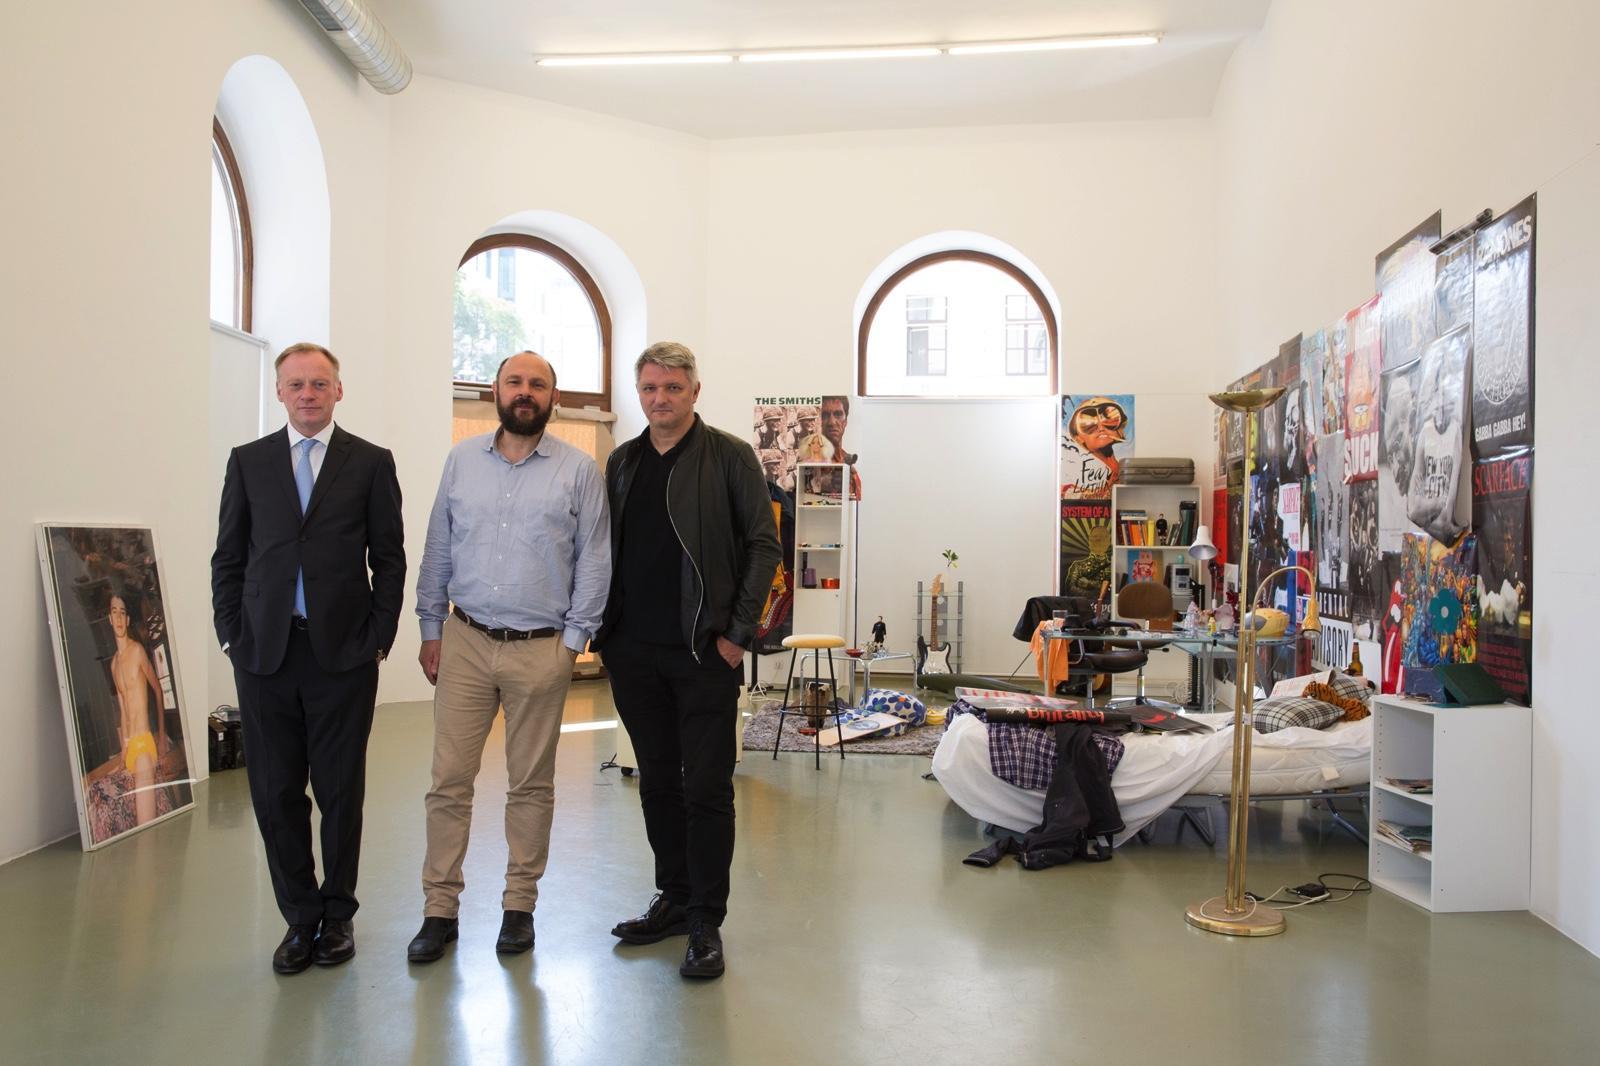 Galerie Crone'sAndreas Osarek and Markus Peichl with curatorDirk  Schönberger Photo:eSeL